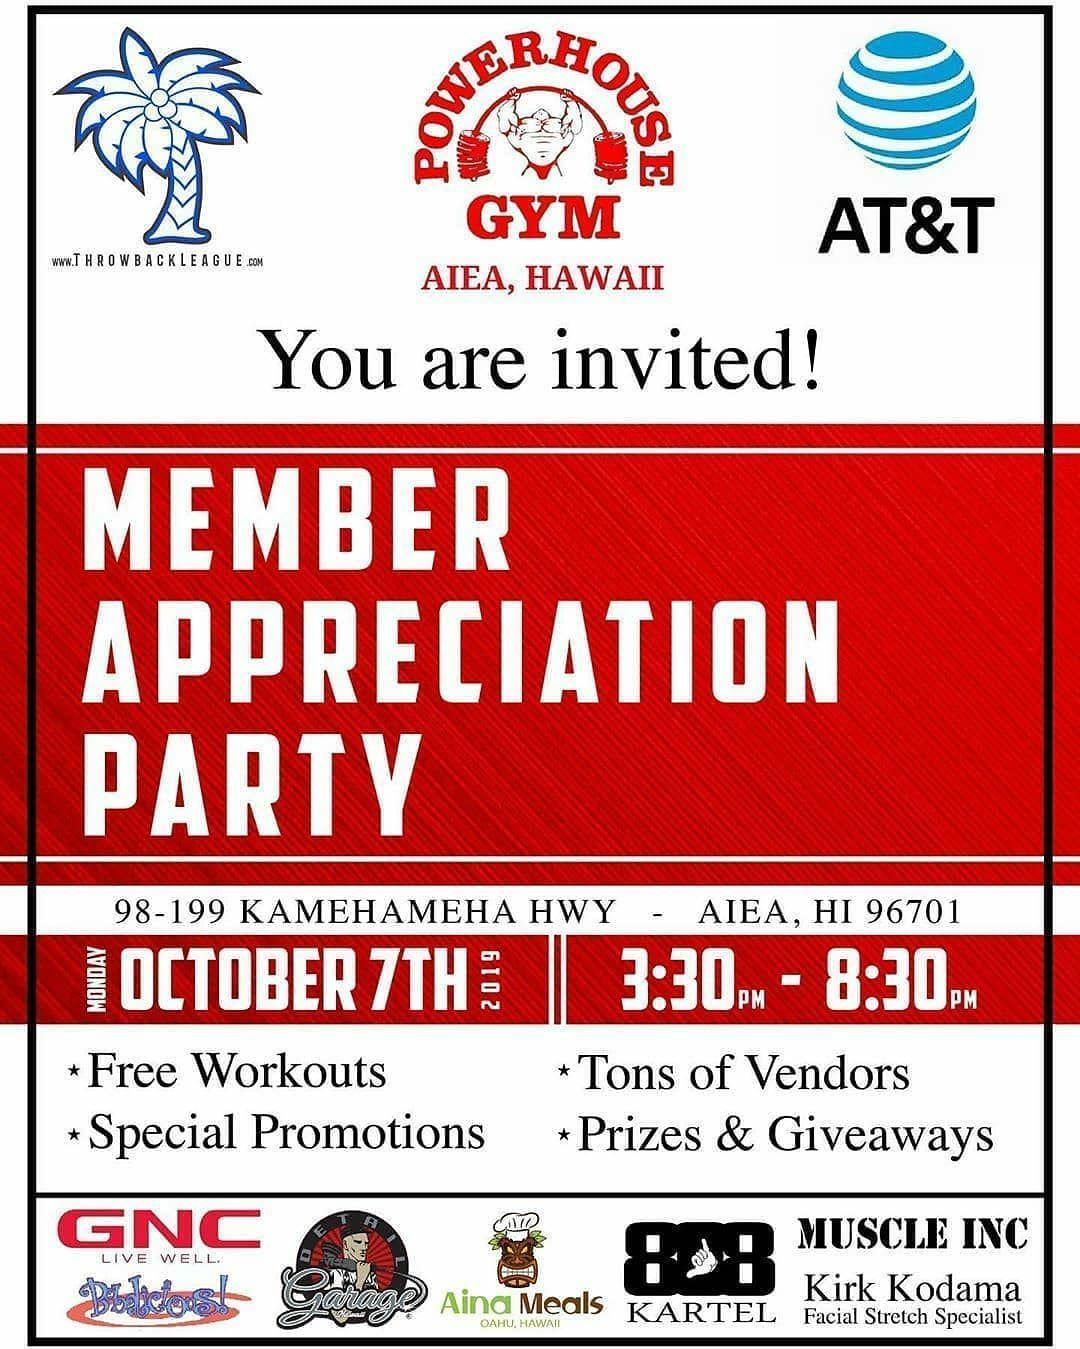 24 hour fitness pearl city membership